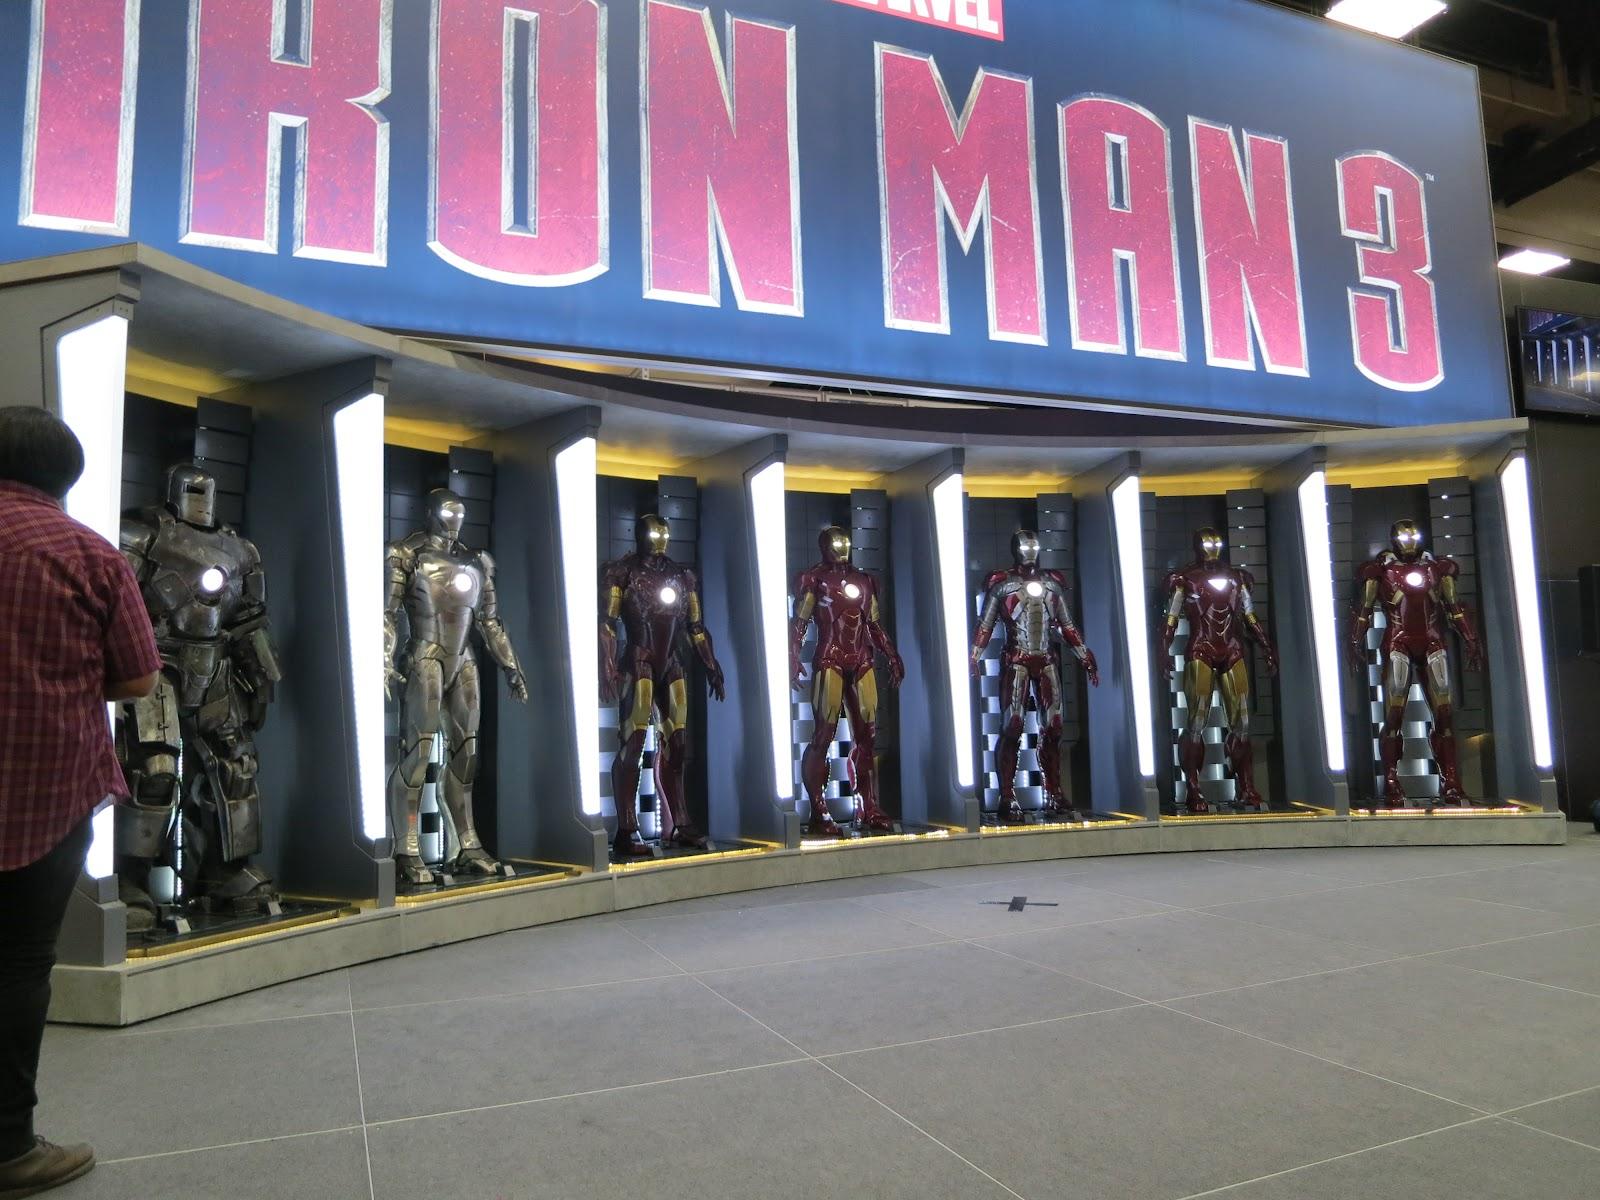 http://4.bp.blogspot.com/-IUoUnuvuPq8/UACIJQsoU6I/AAAAAAAABEY/2gJMnvrz74k/s1600/Iron_Man_3_Brings_Tony_Stark_Armor_Comic_Con_1342058508.jpg